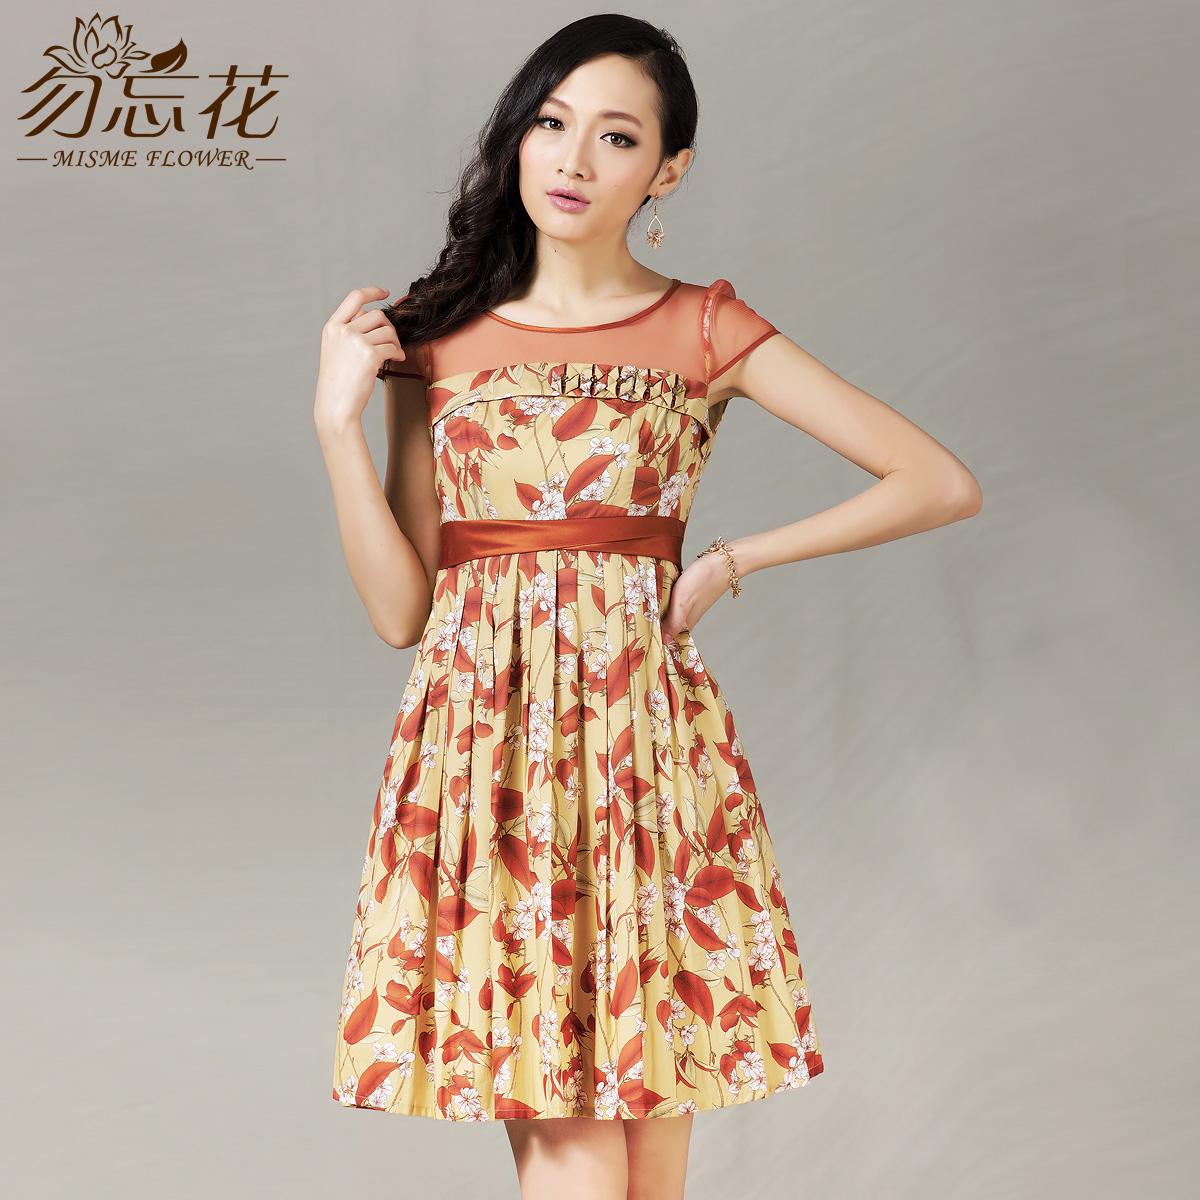 Flower women's 2013 summer fancy gauze patchwork w3213 one-piece dress(China (Mainland))